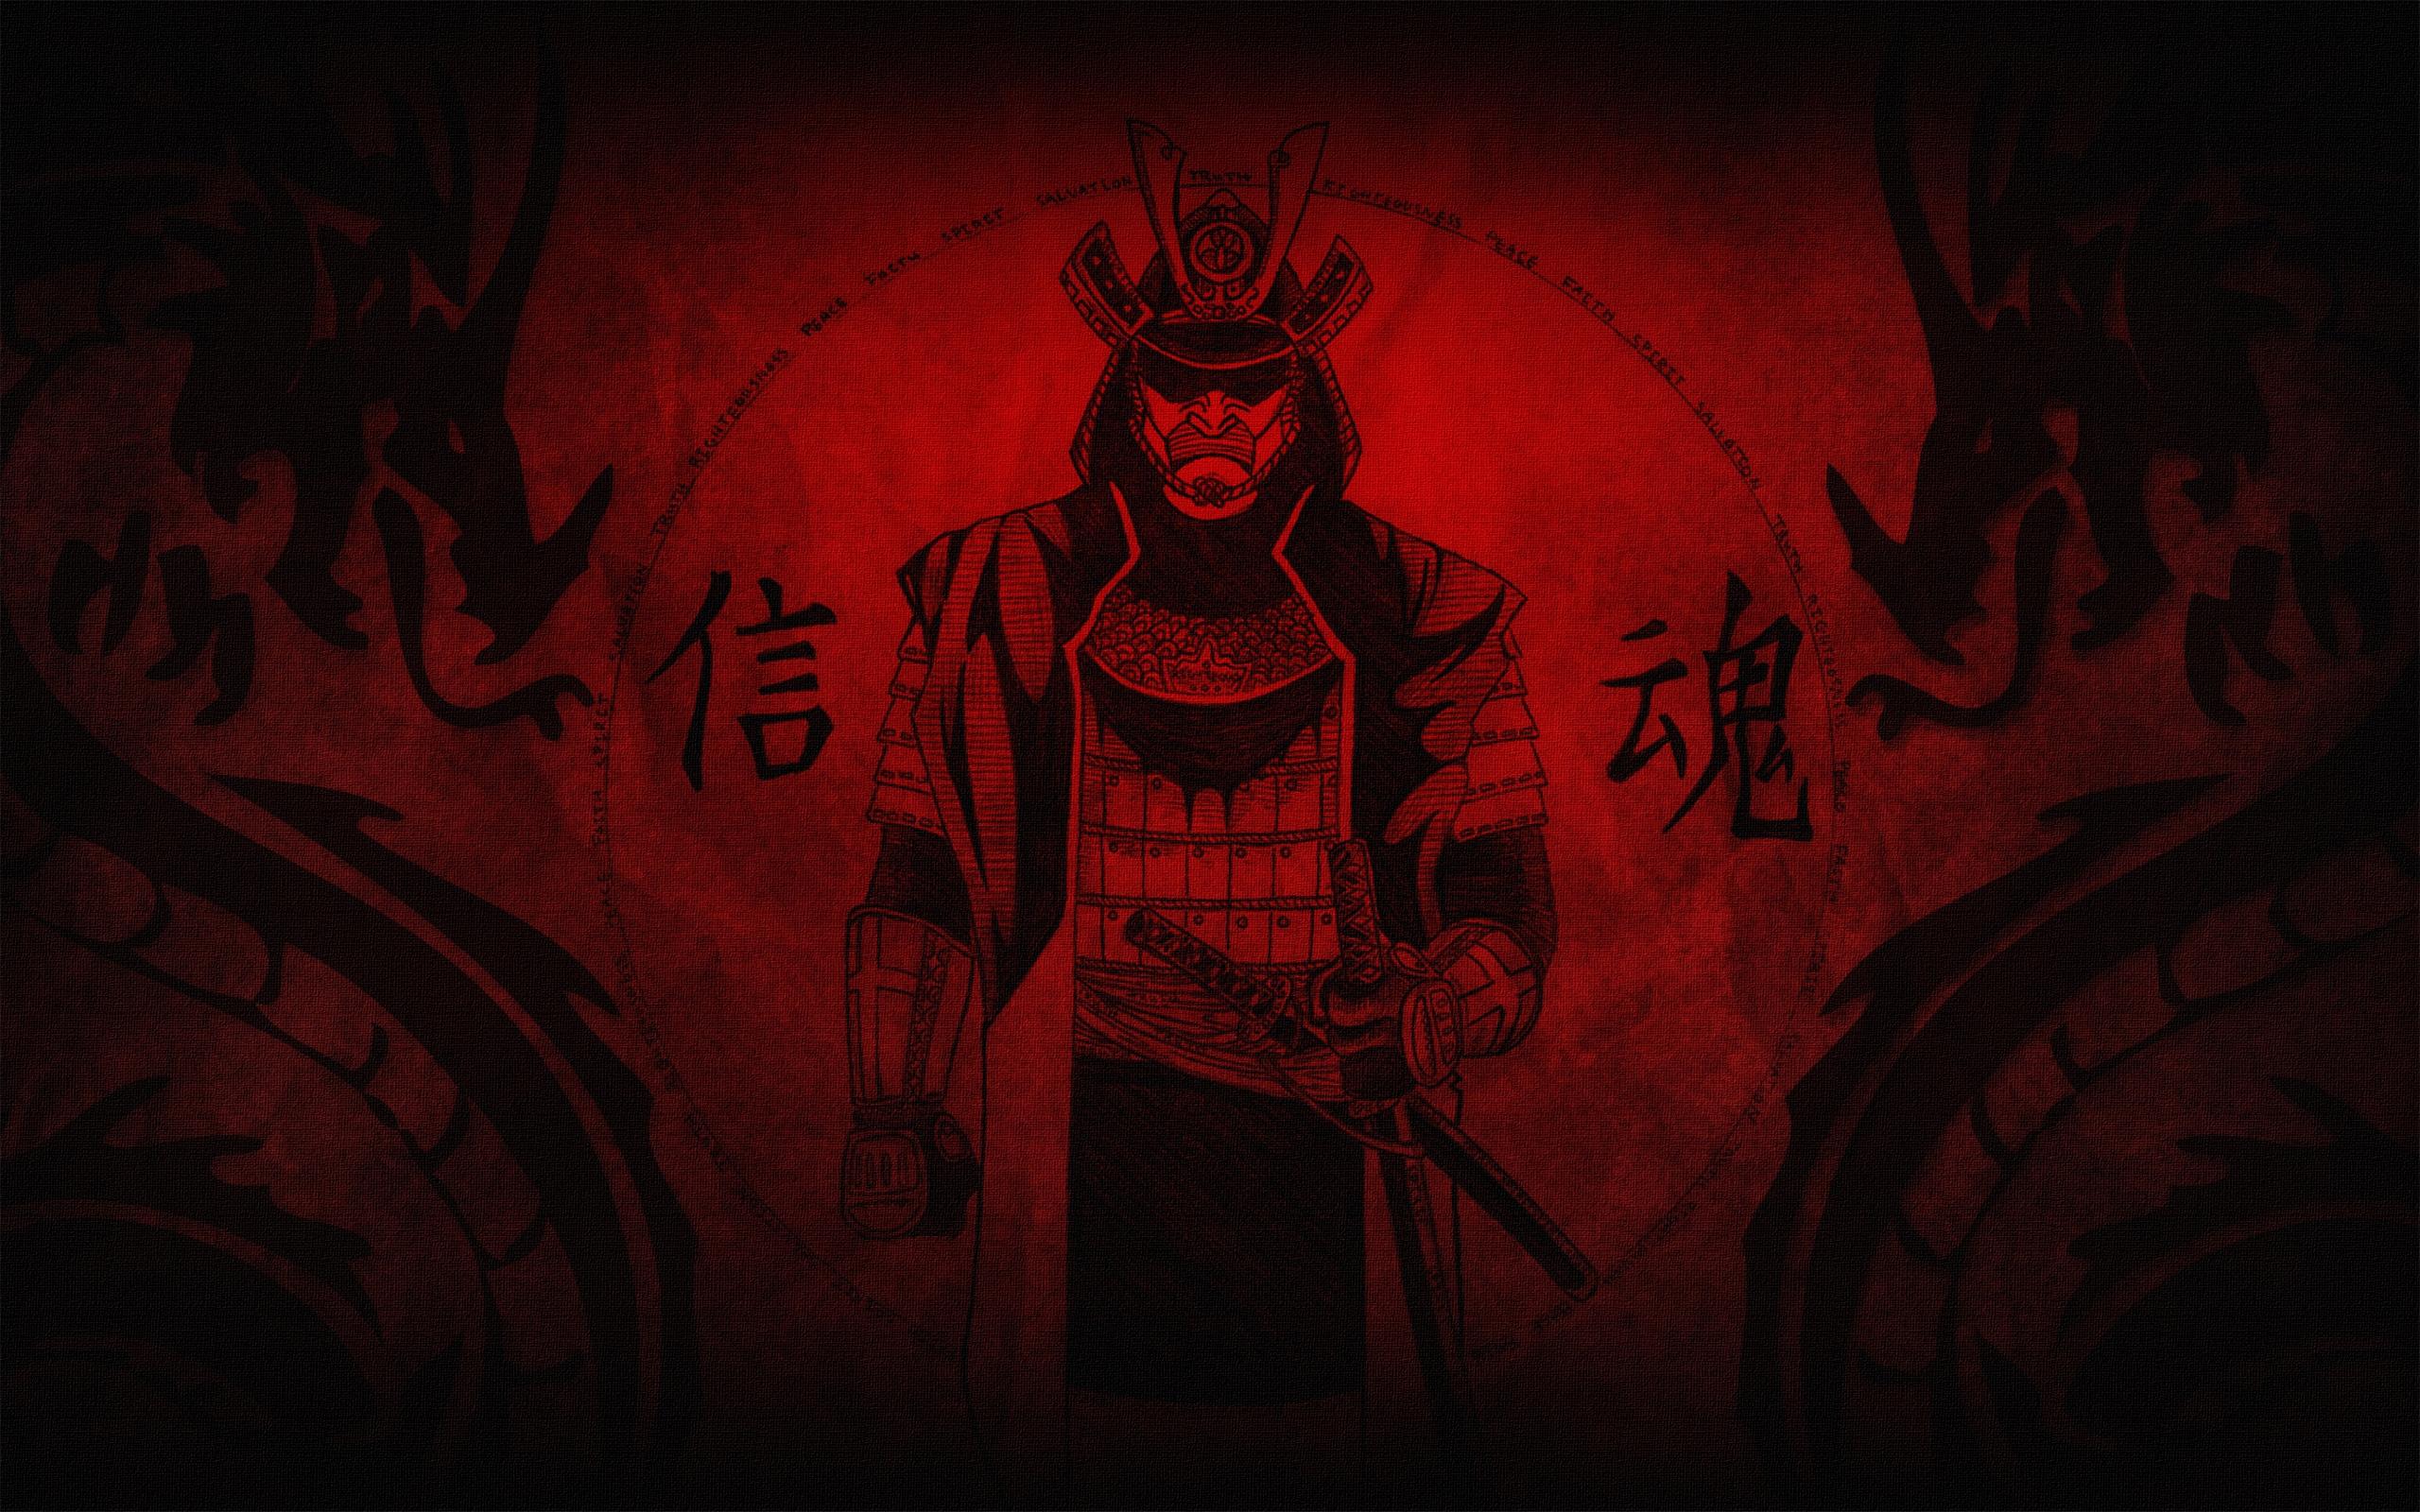 Wallpaper Red 2560x1440 >> Samurai HD Wallpaper | Background Image | 2560x1600 | ID:103606 - Wallpaper Abyss